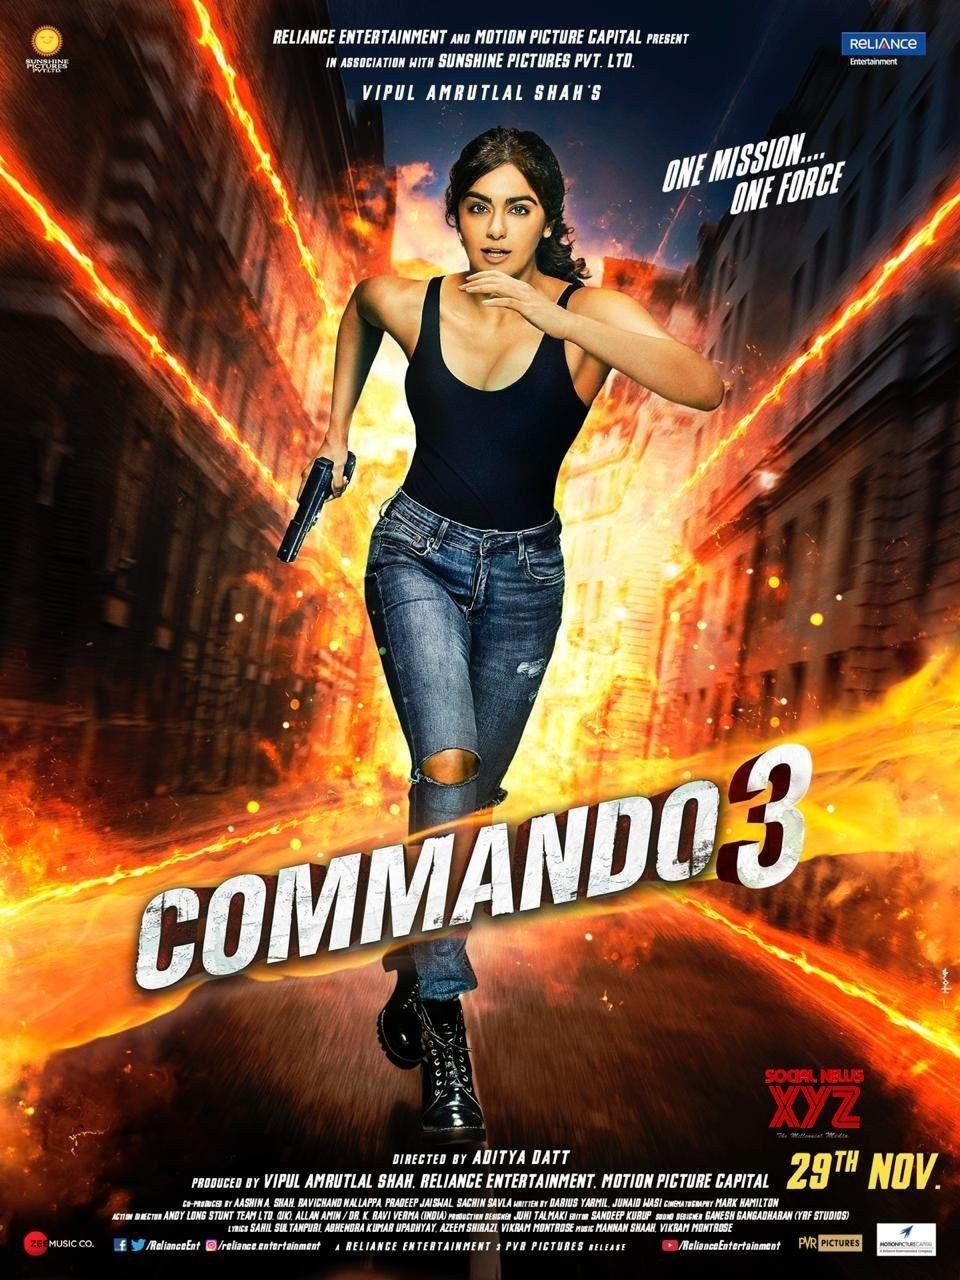 Commando 3 Movie Character Posters Social News Xyz Movie Stars Hindi Movies Bollywood Movies Online